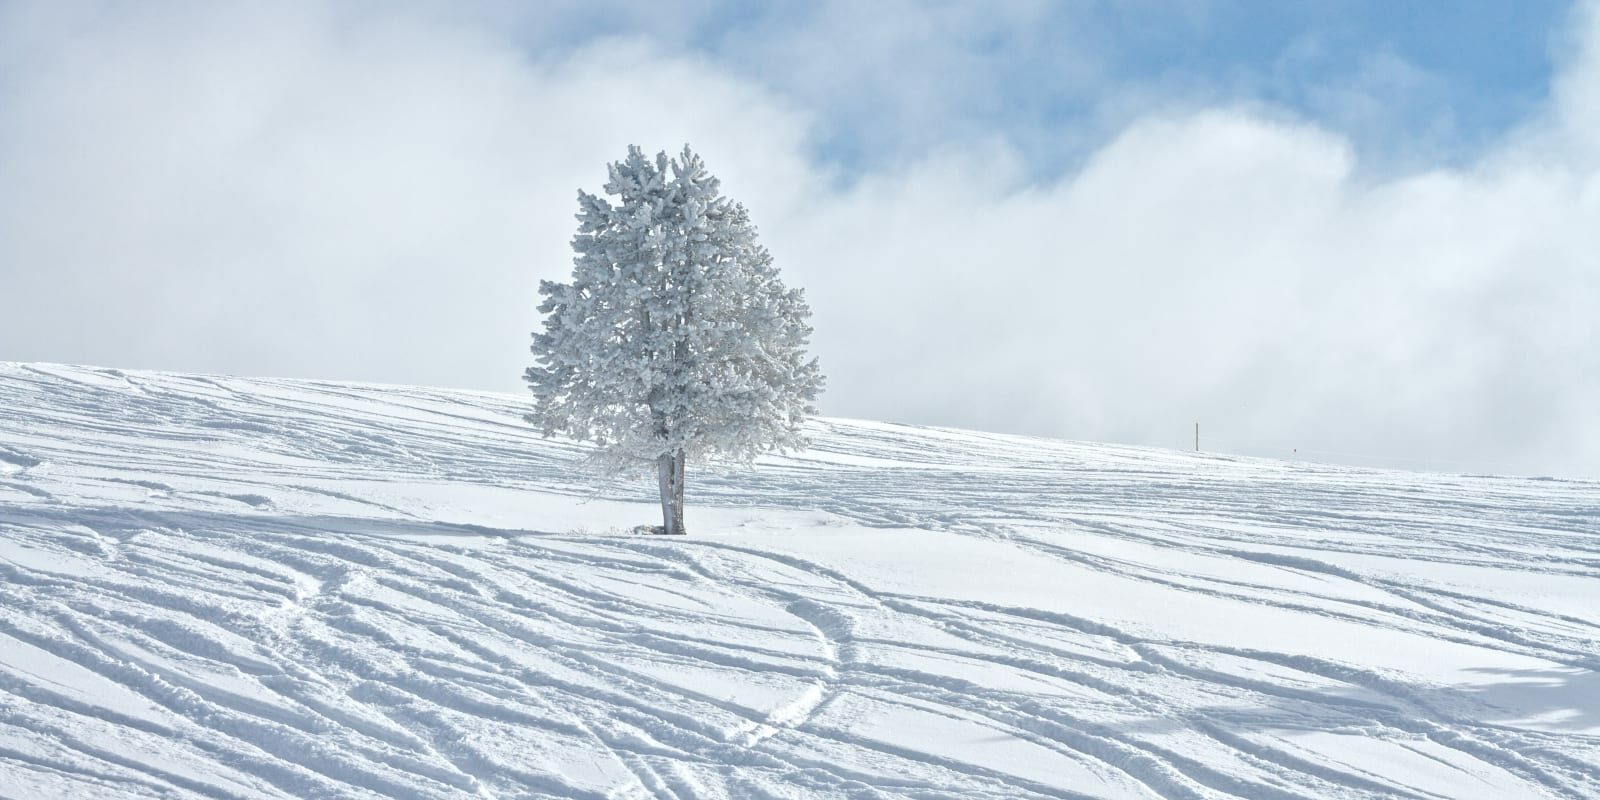 Colorado Winter Vacation Spot Vail Ski Resort Powder Day